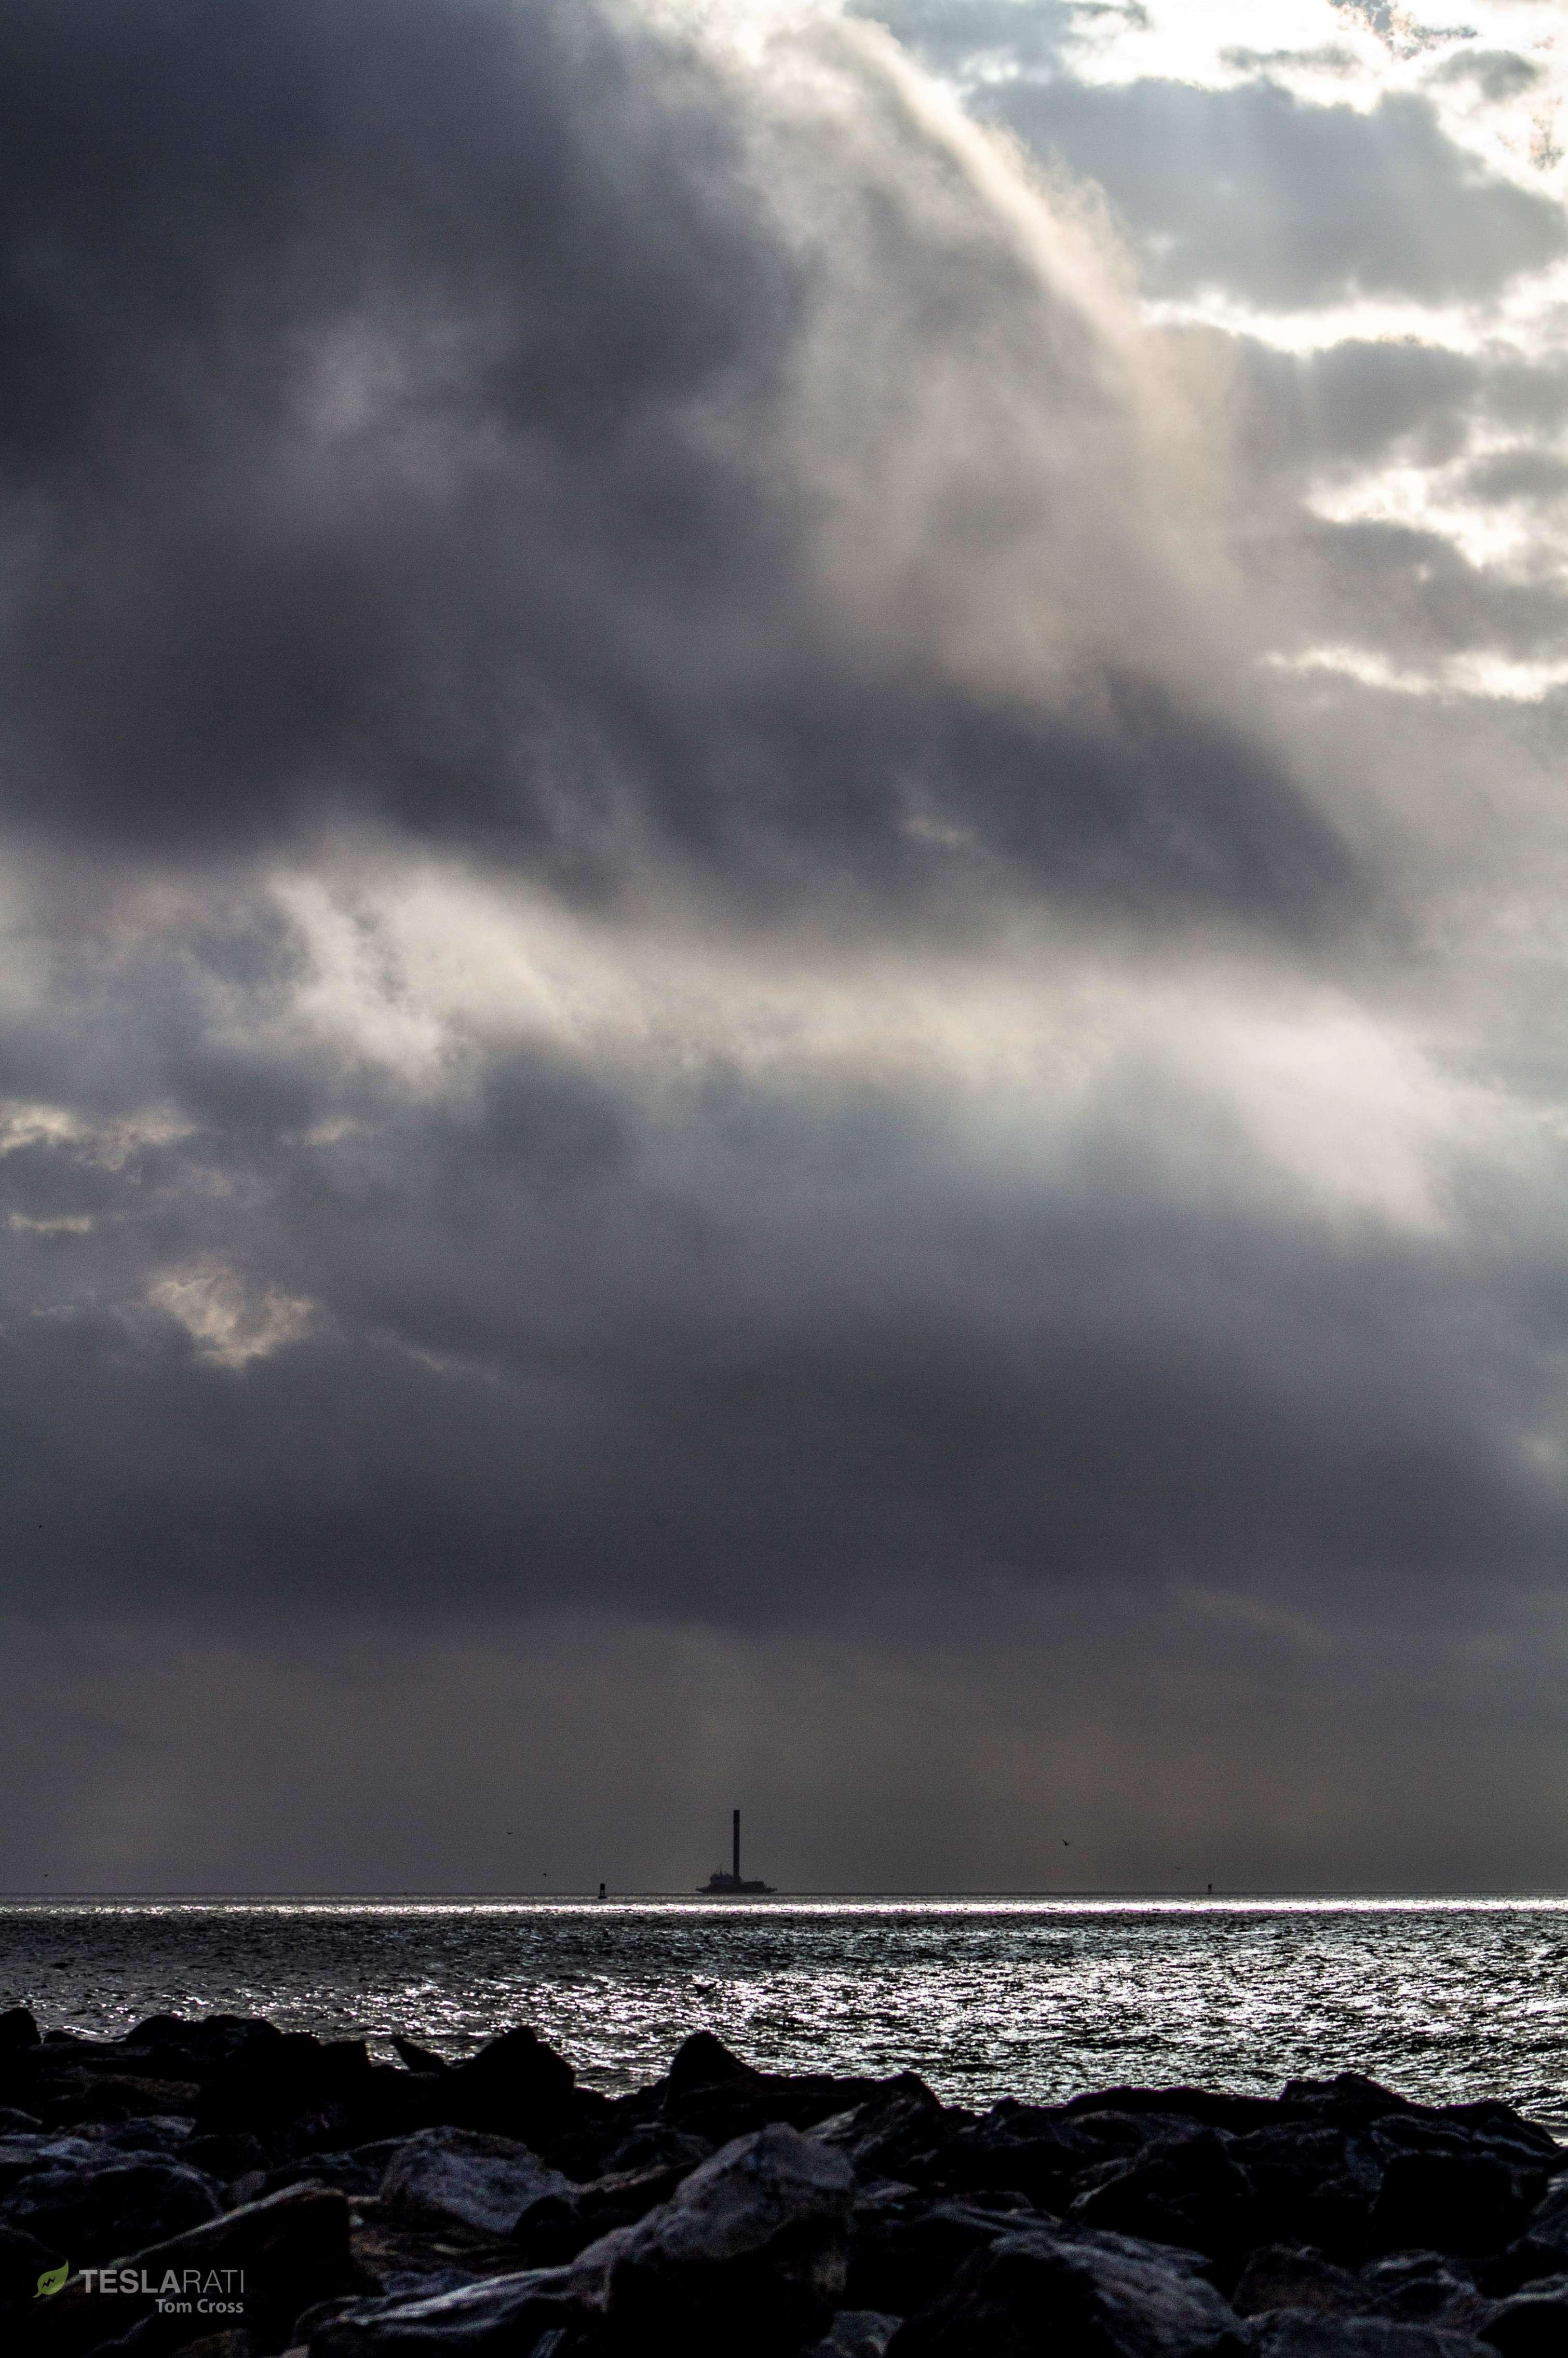 Falcon 9 B1048 PSN-6 OCISLY return 022419 (Tom Cross) 1 (c)